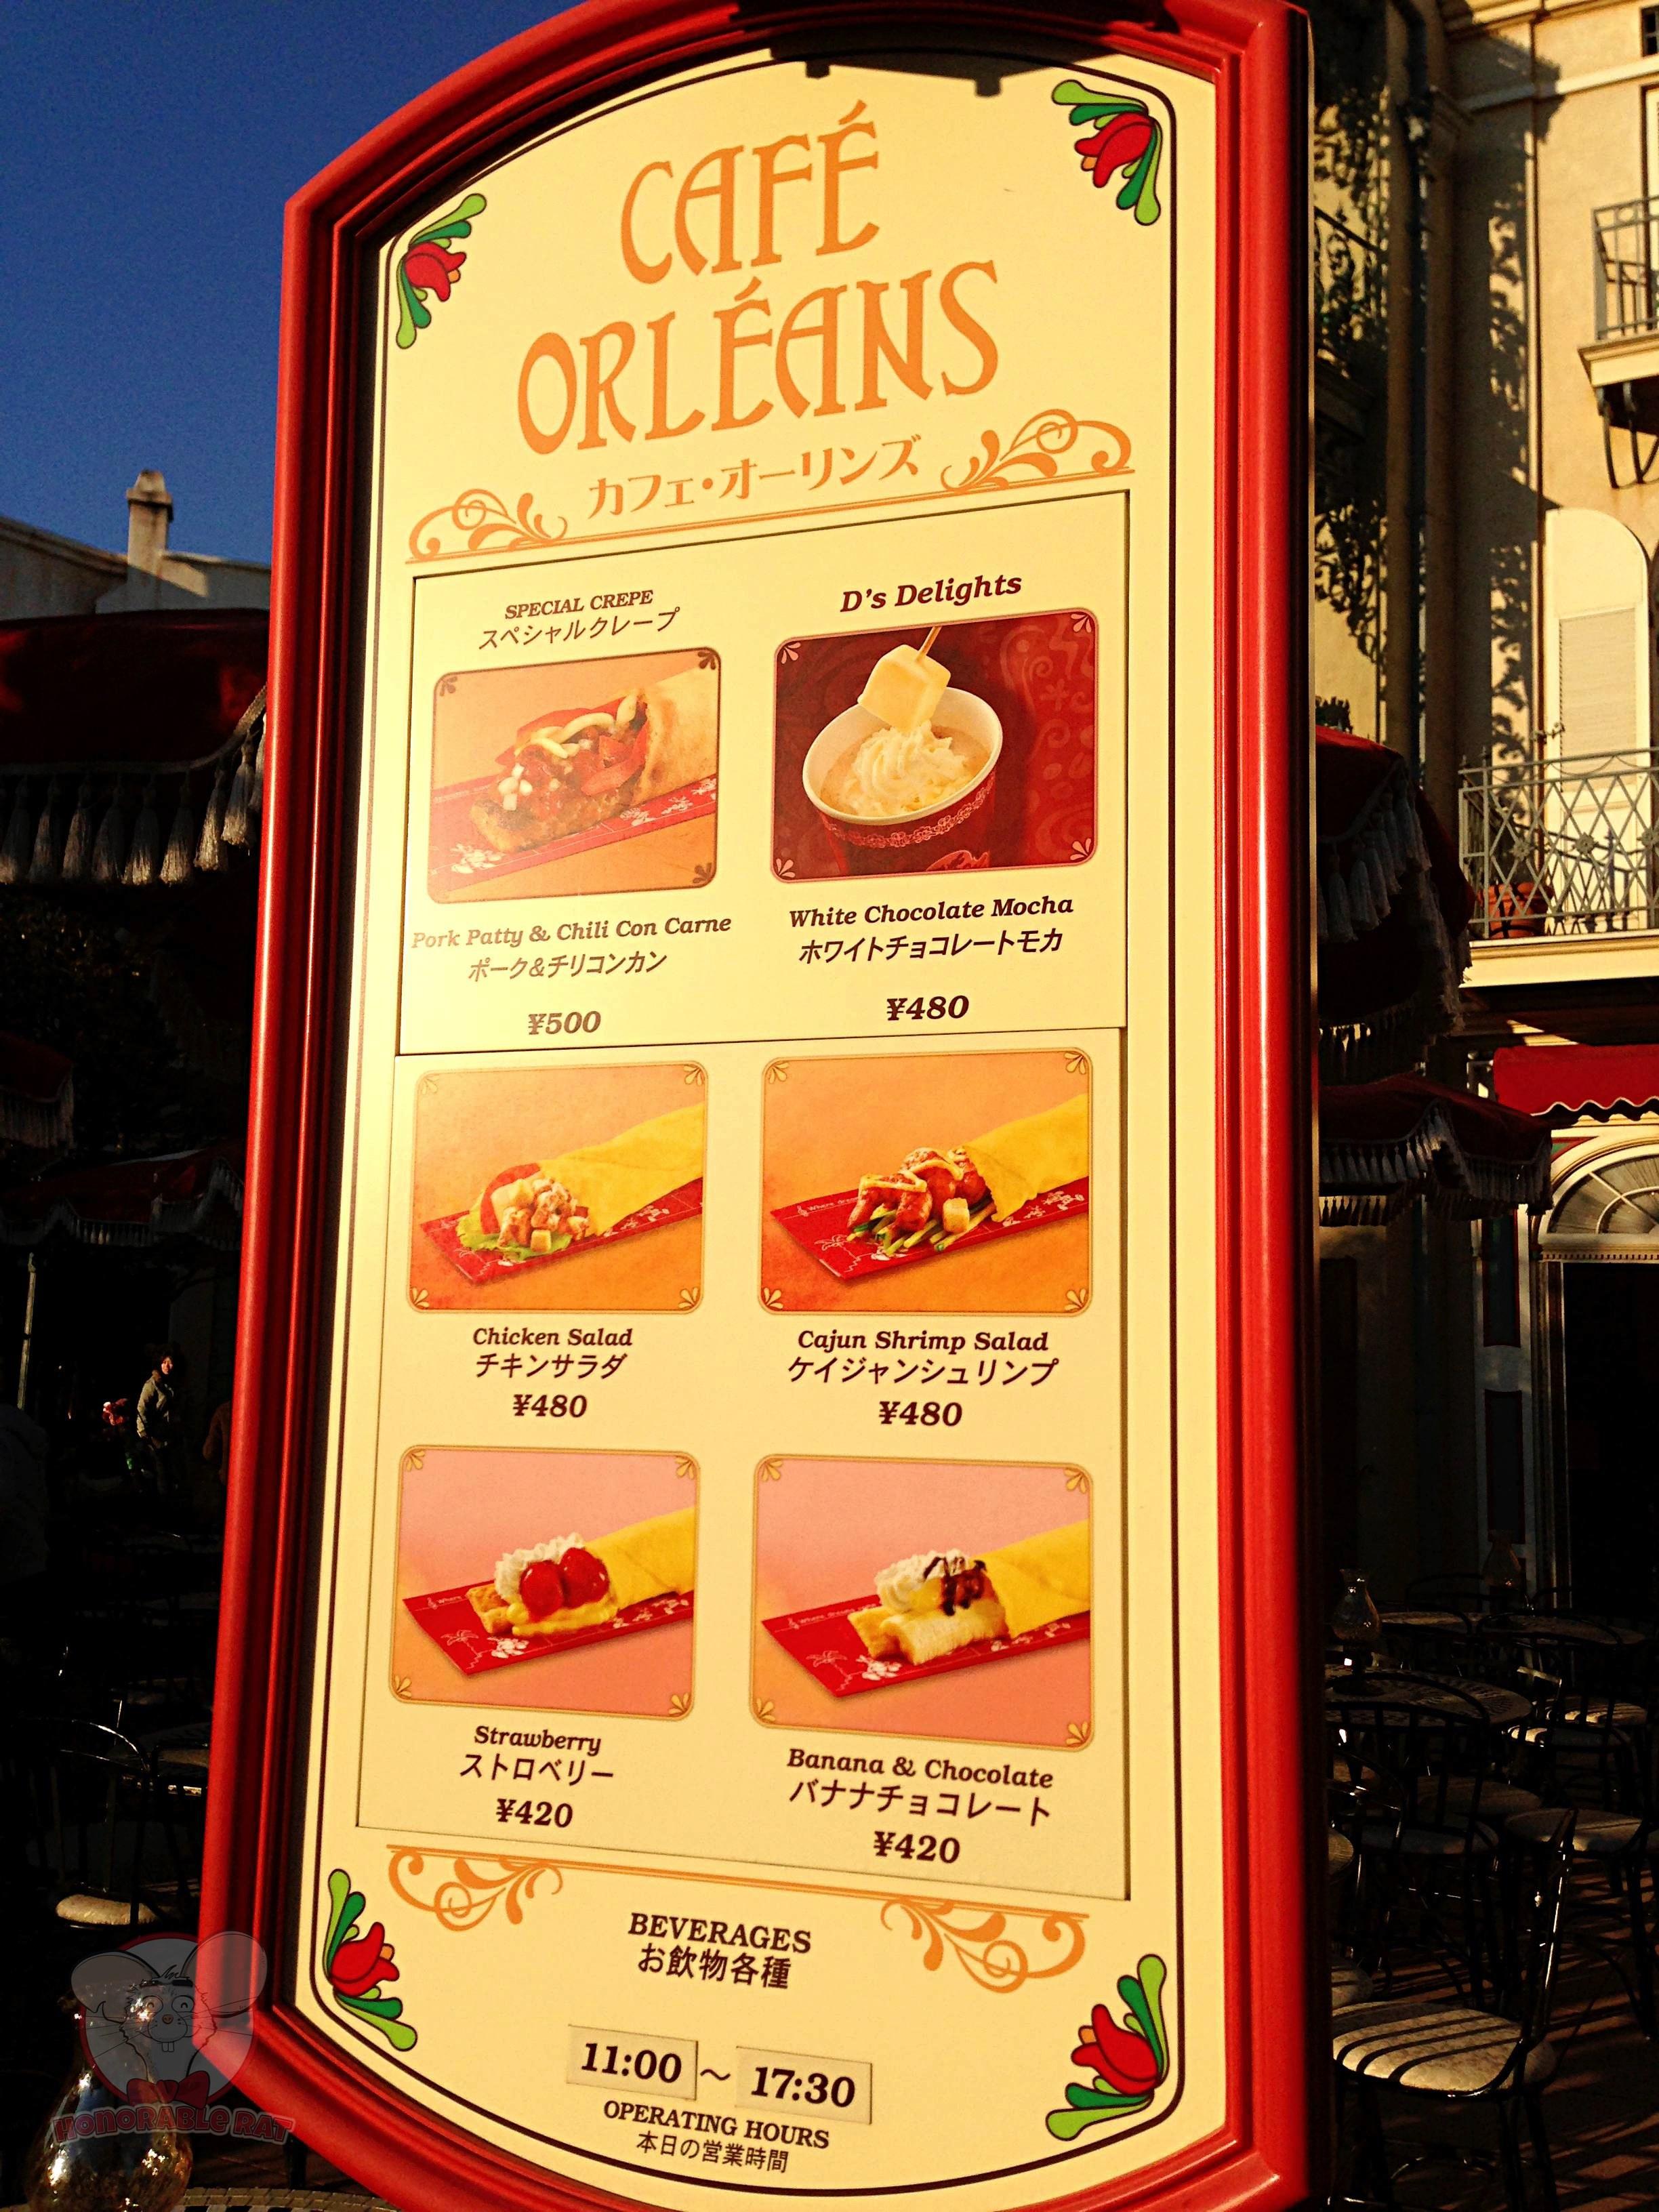 Cafe Orleans' Menu